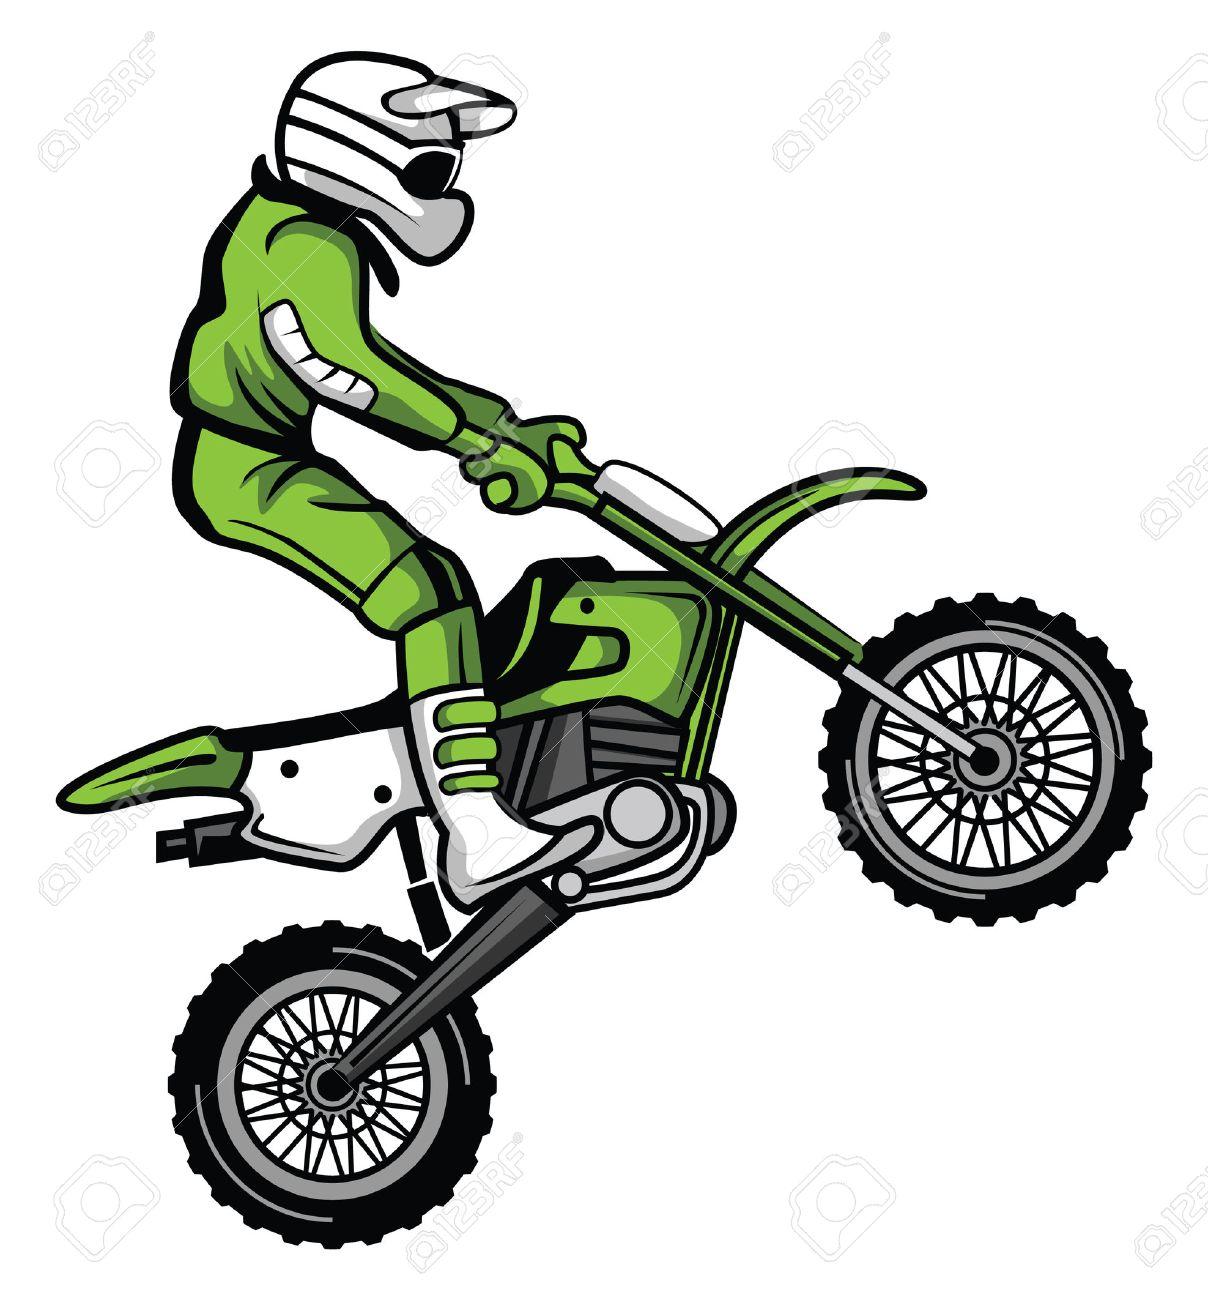 1208x1300 Motocross Clipart Group